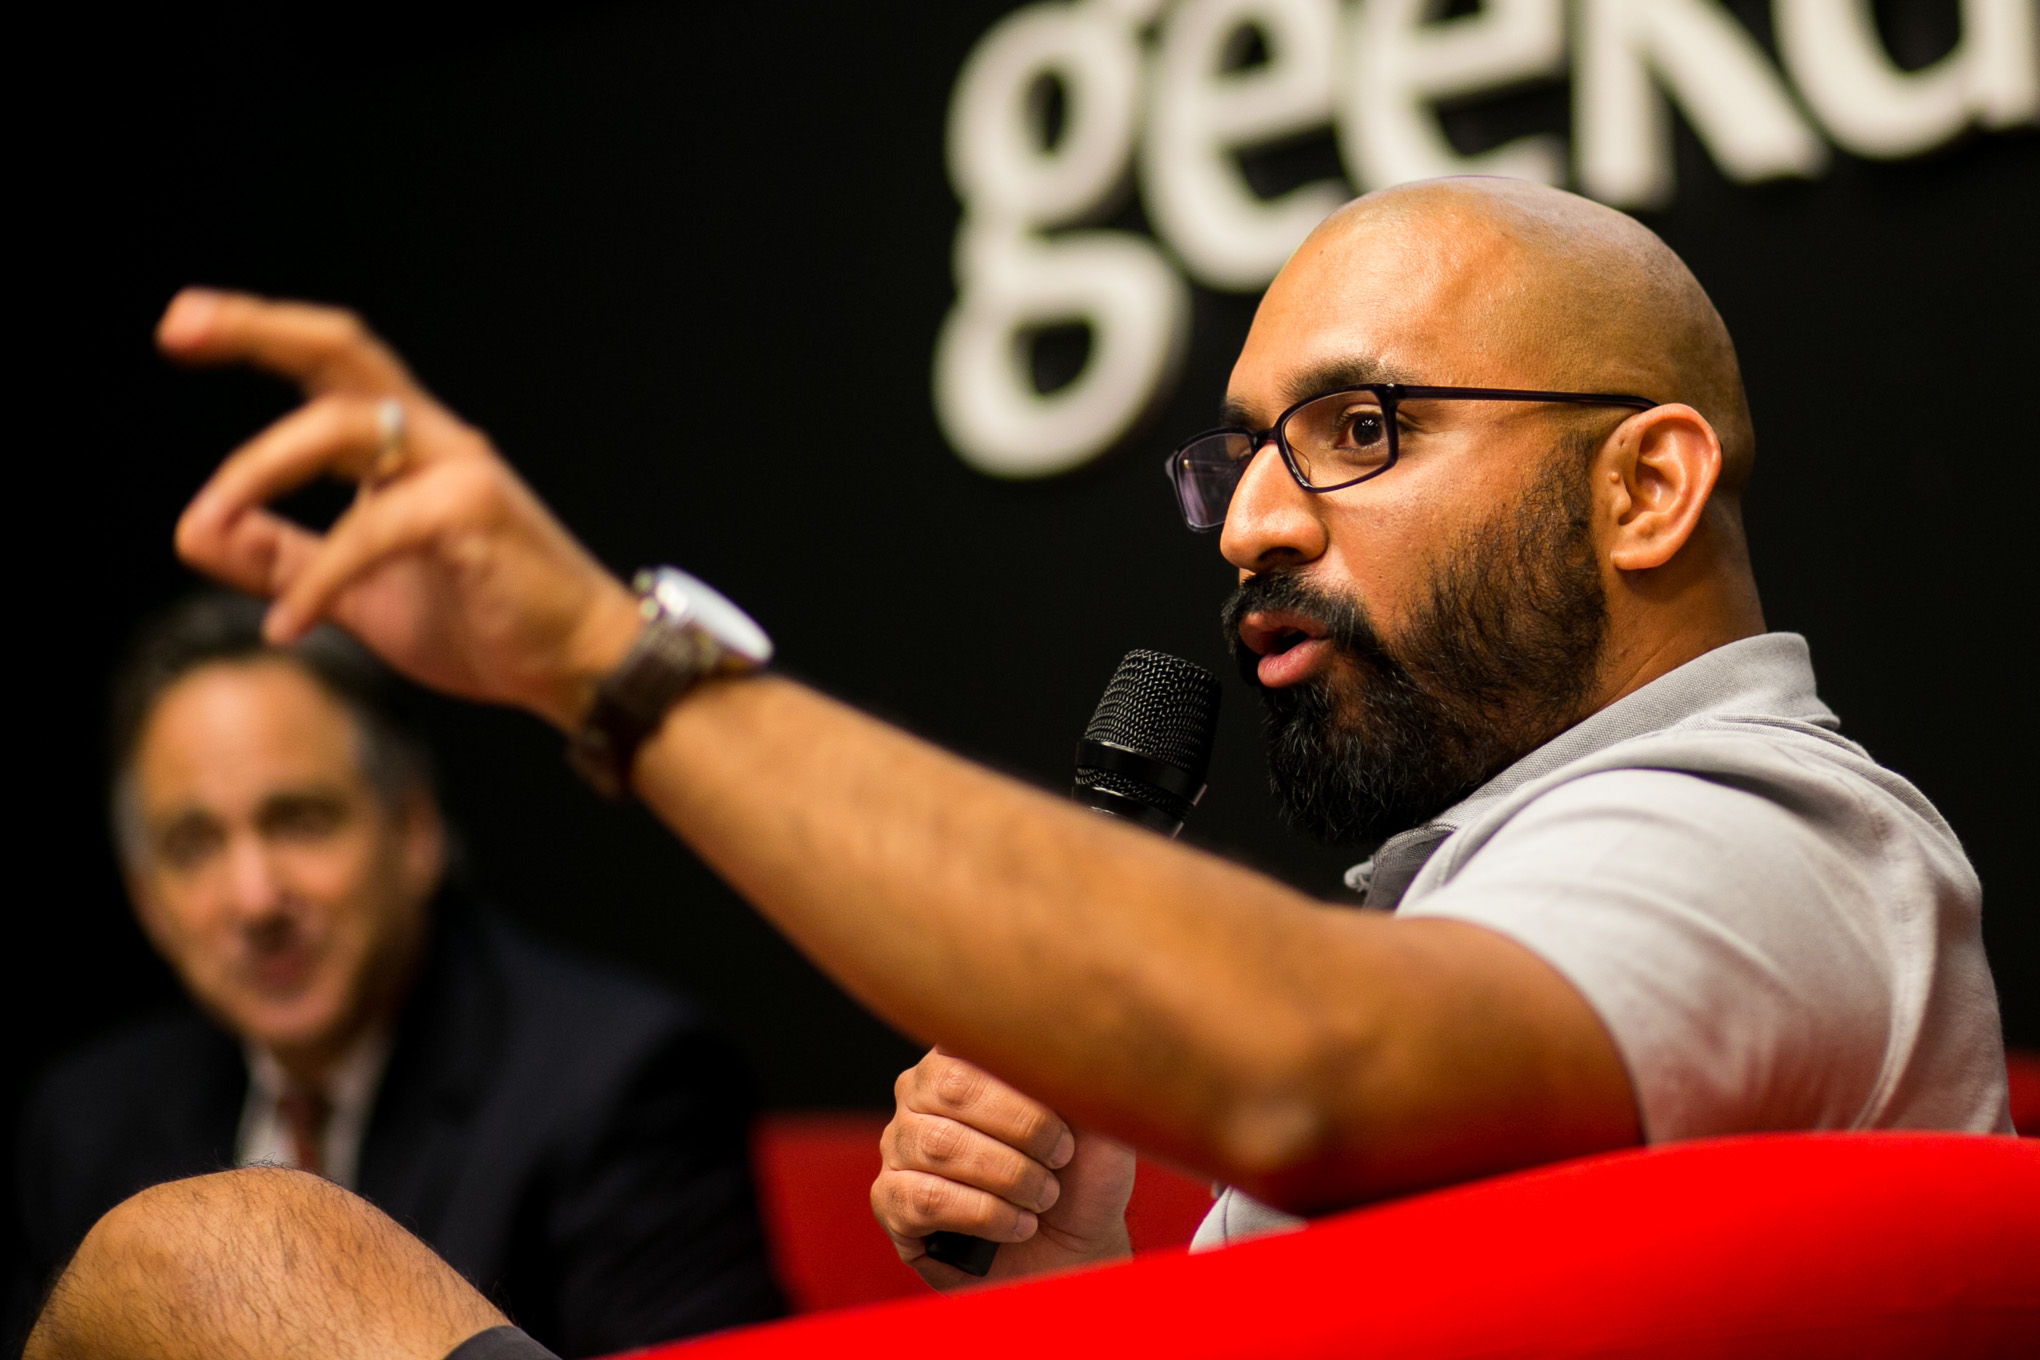 Director of Geekdom Lorenzo Gomez speaks about the importance marketing plays. Photo by Kathryn Boyd-Batstone